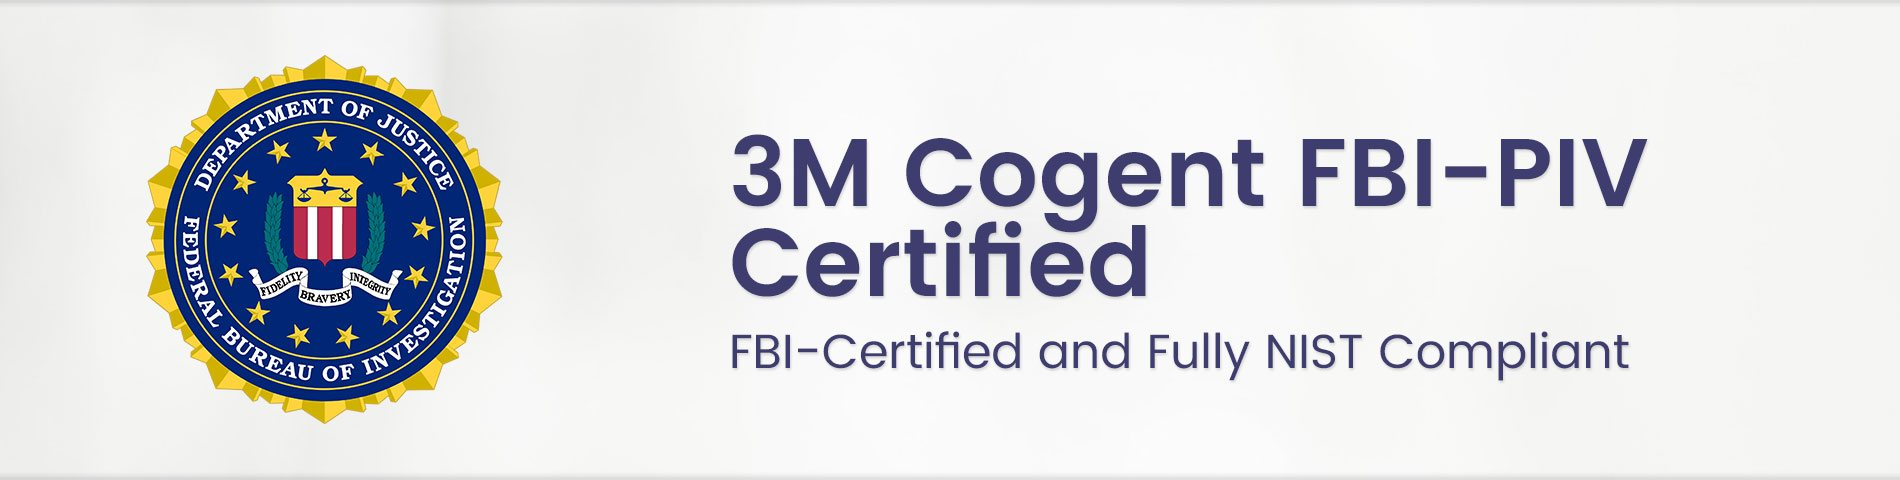 FBI Certification